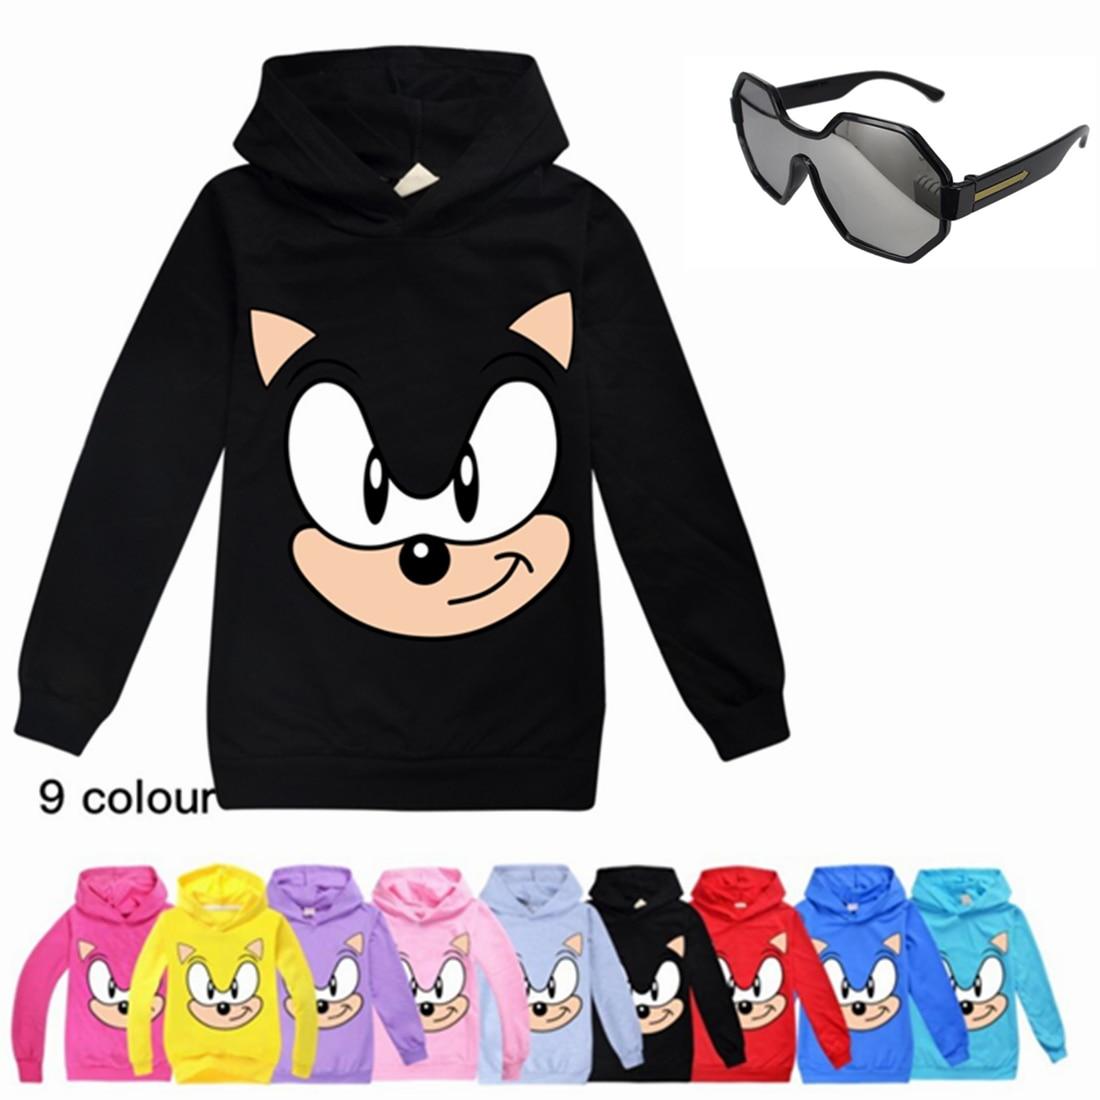 2020 Summer Sports Fashion Sonic The Hedgehog Cotton T Shirt Boys Girls Cartoon Printed Short Tee T-Shirt Kids Children Clothes